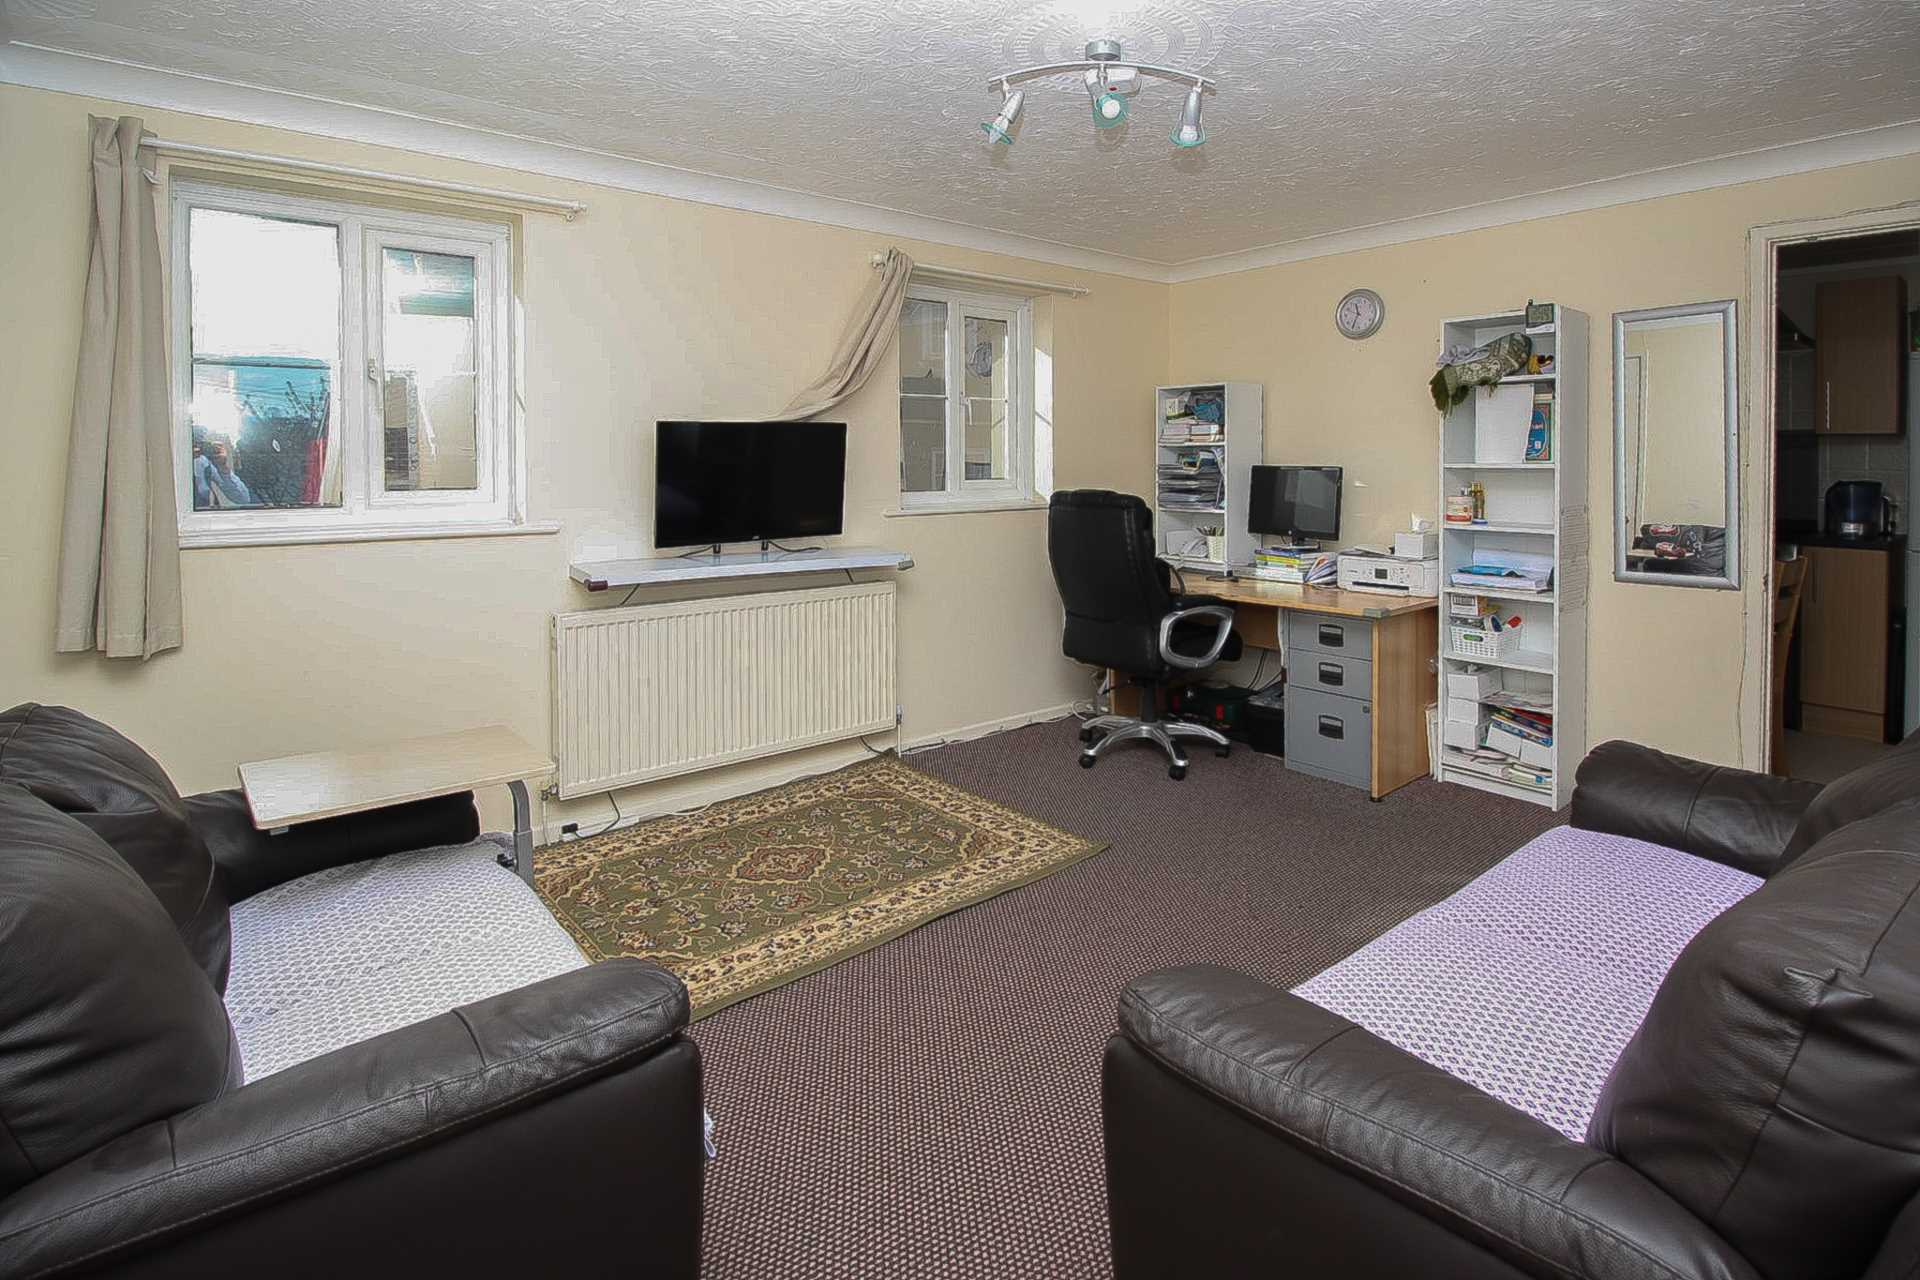 2 bed flat for sale in Dorset Mews, Dorset Street, Blandford Forum 2